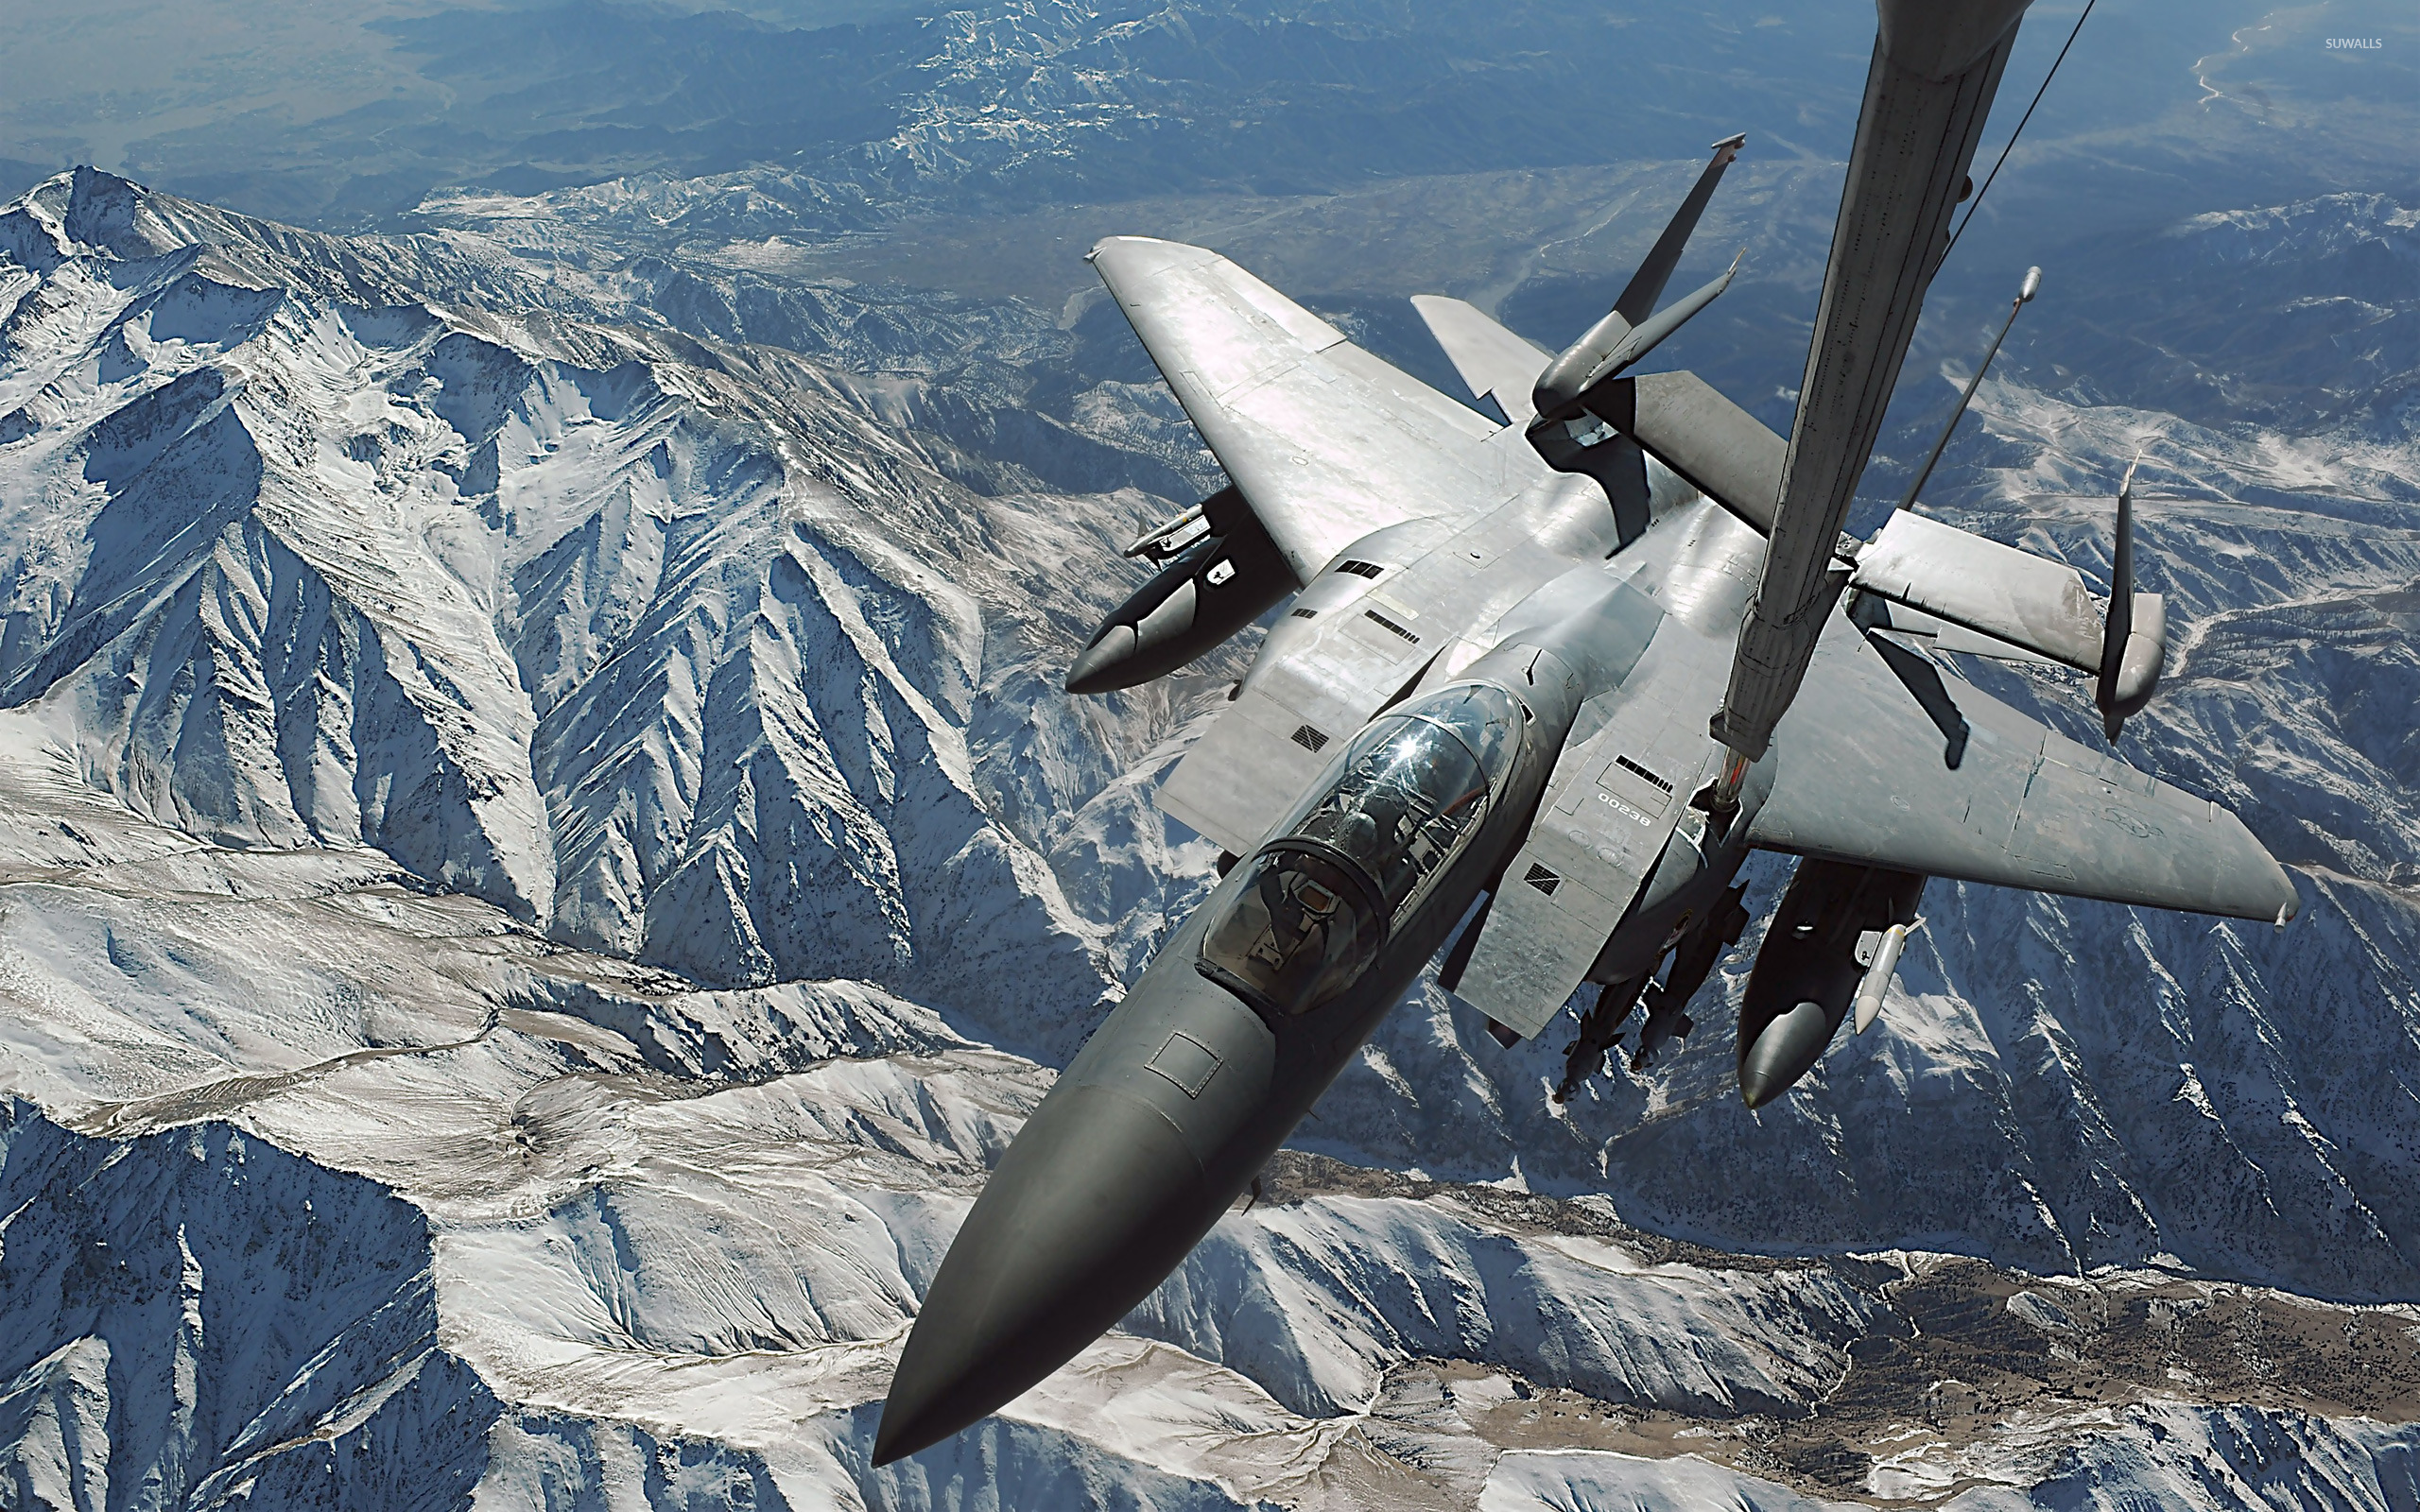 mcdonnell douglas f-15 eagle wallpaper - aircraft wallpapers - #11704